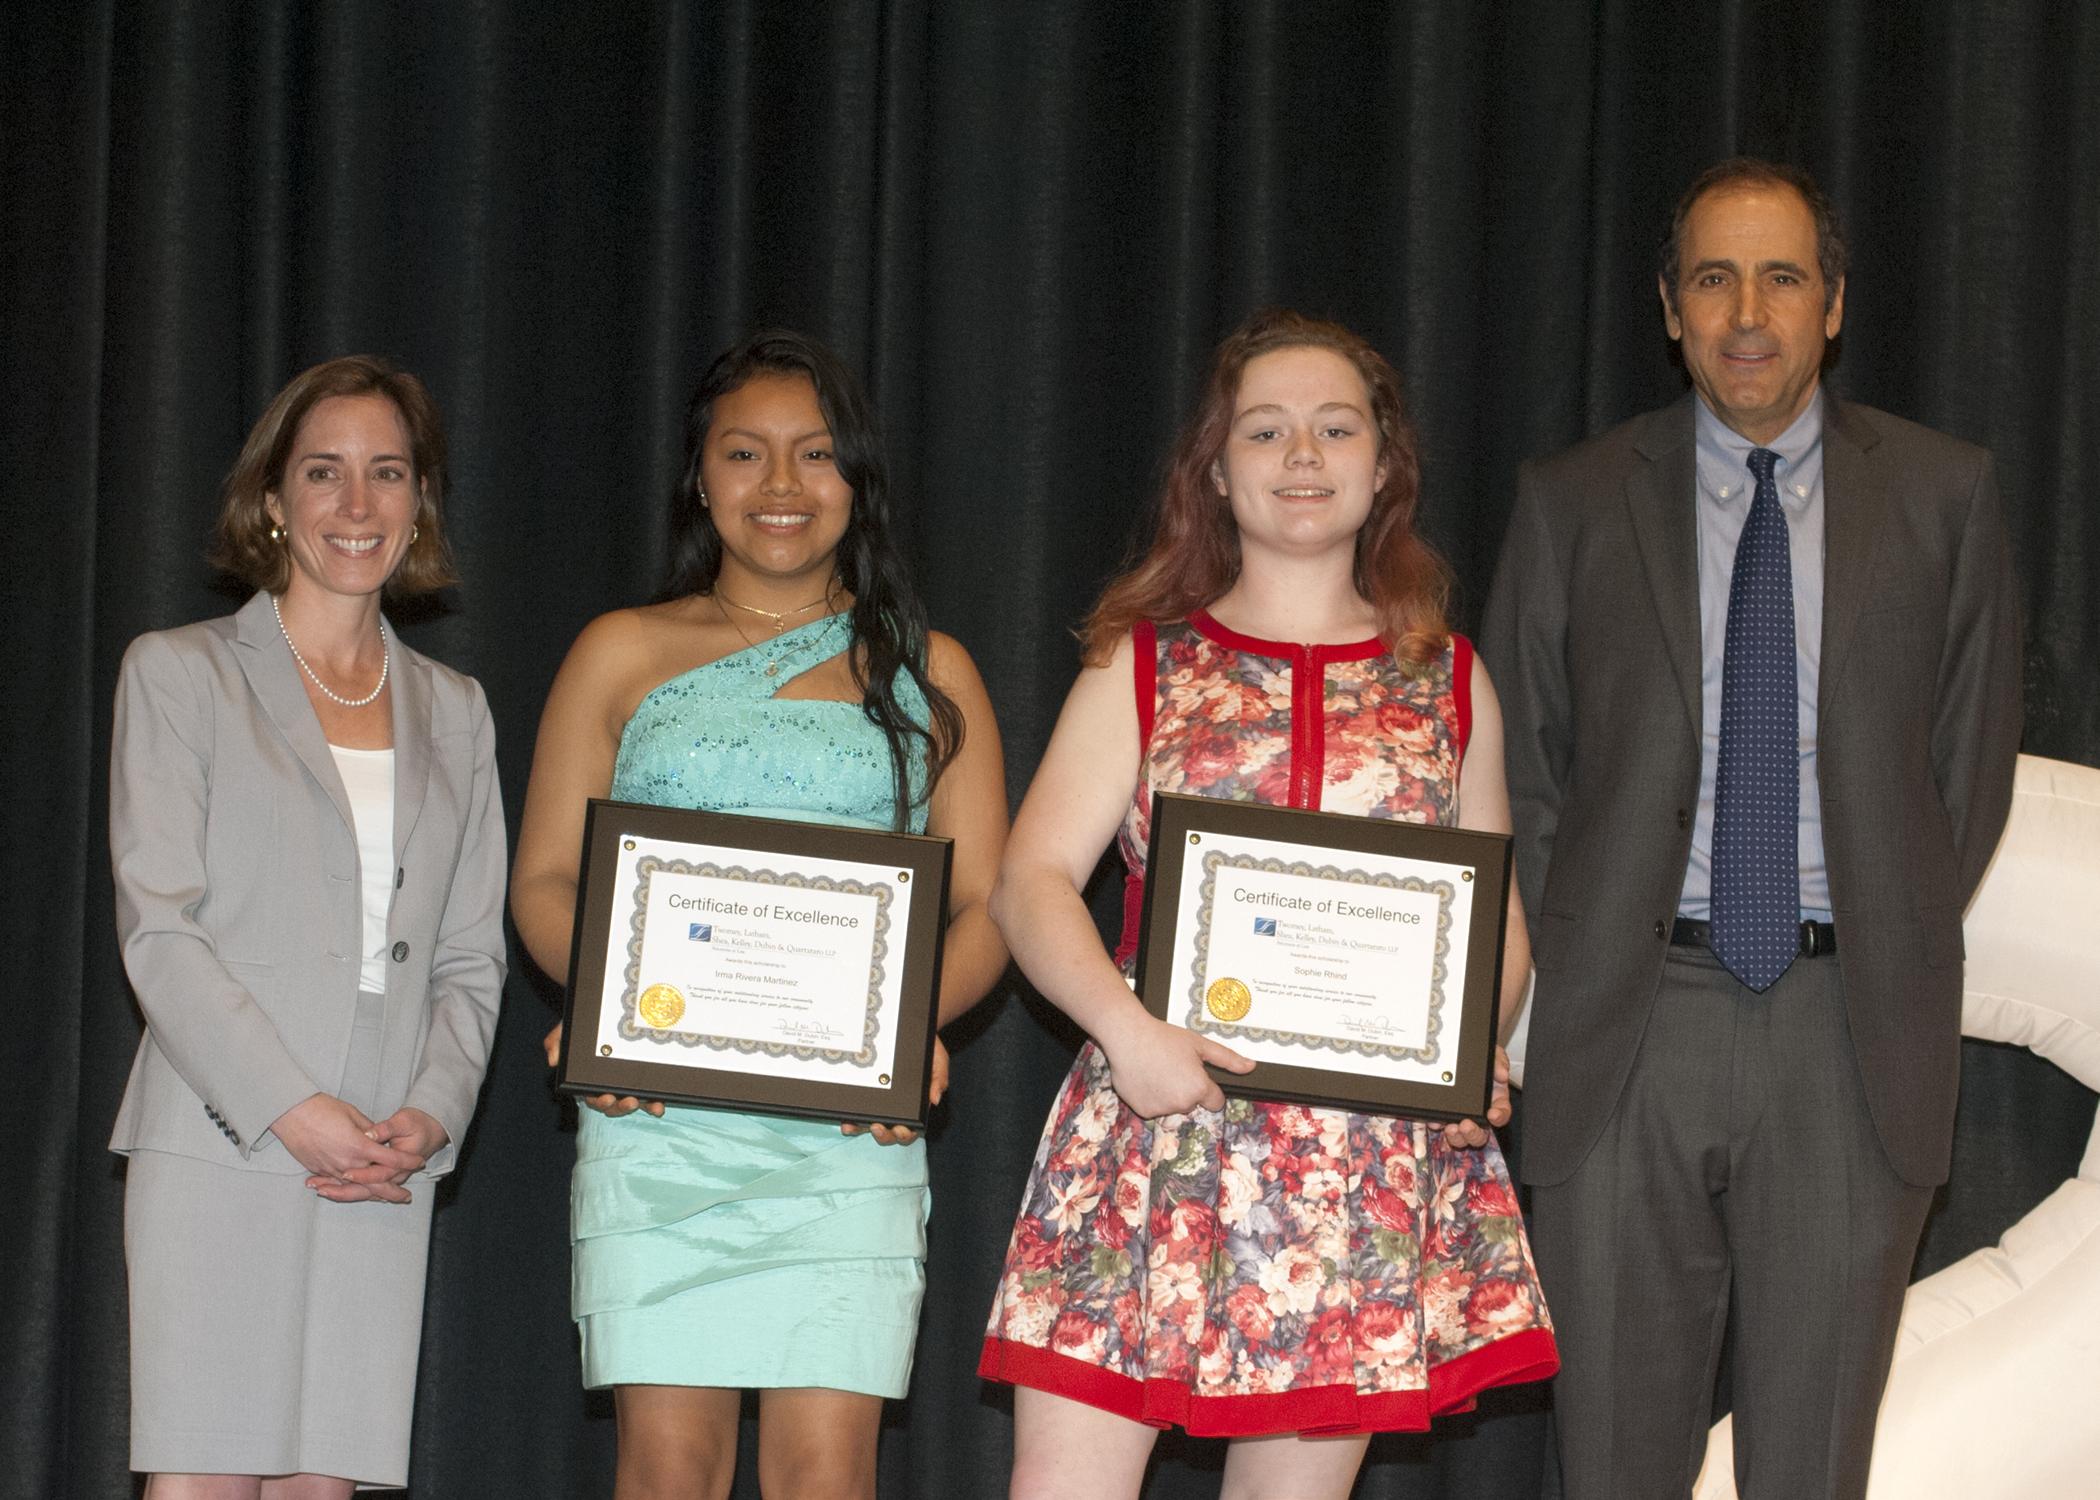 Southampton high school scholarship recipients, David Dubin and Alexandra Halsey-Storch